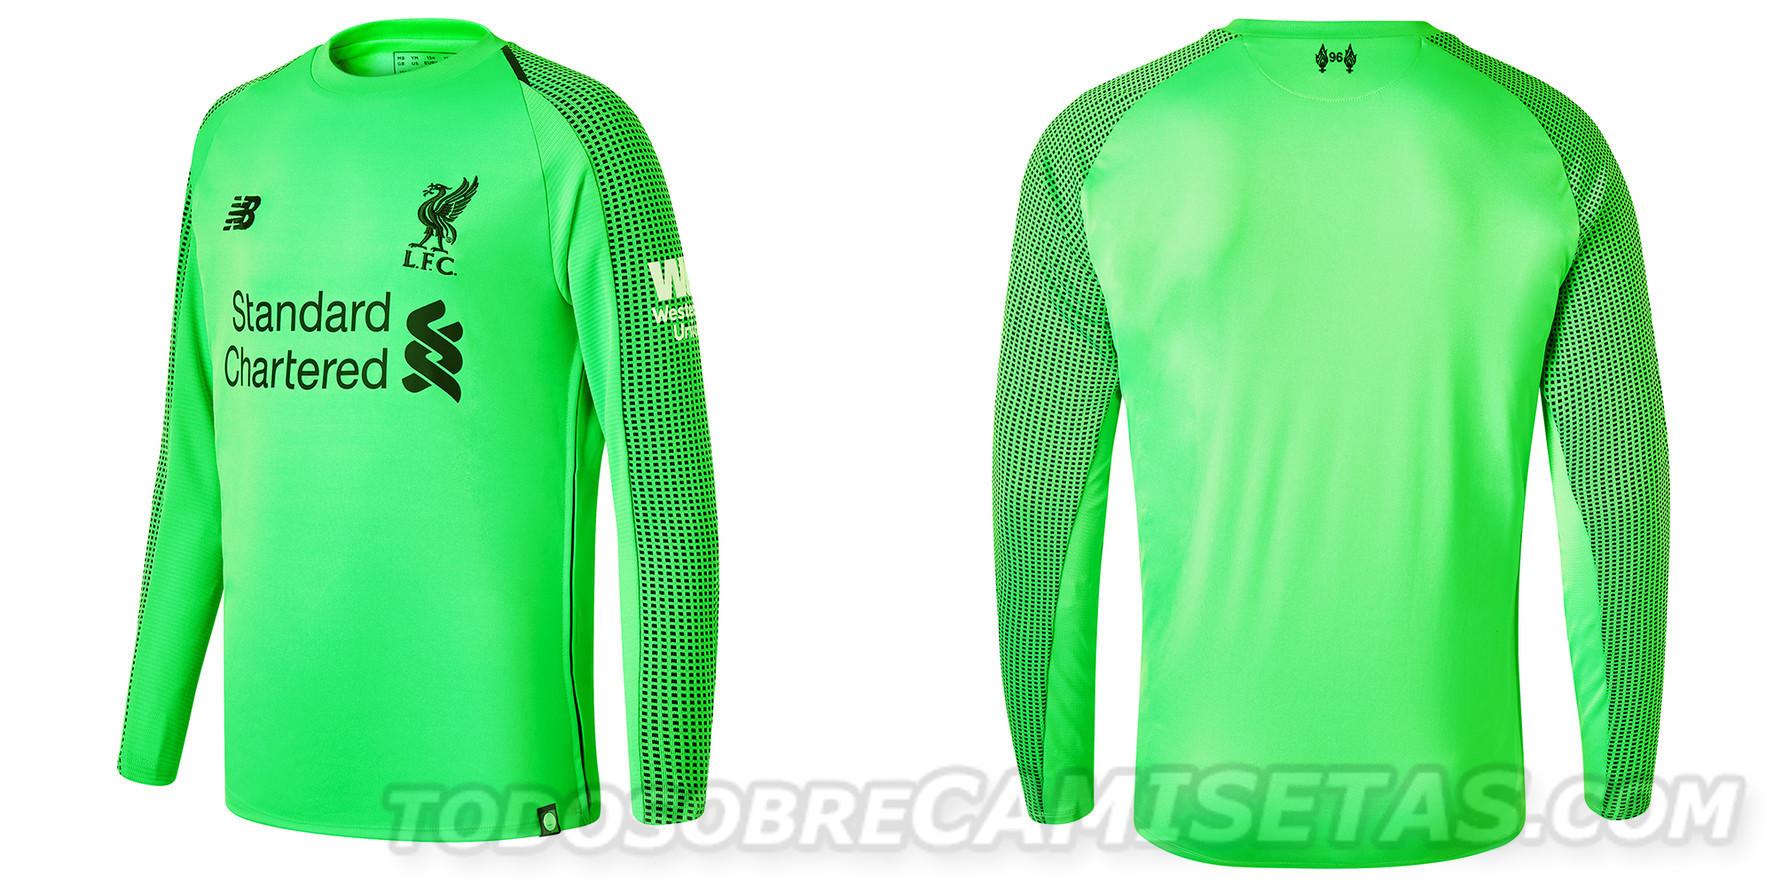 Liverpool-2018-19-New-NEW-BALANCE-GK-away-kit-1.jpg